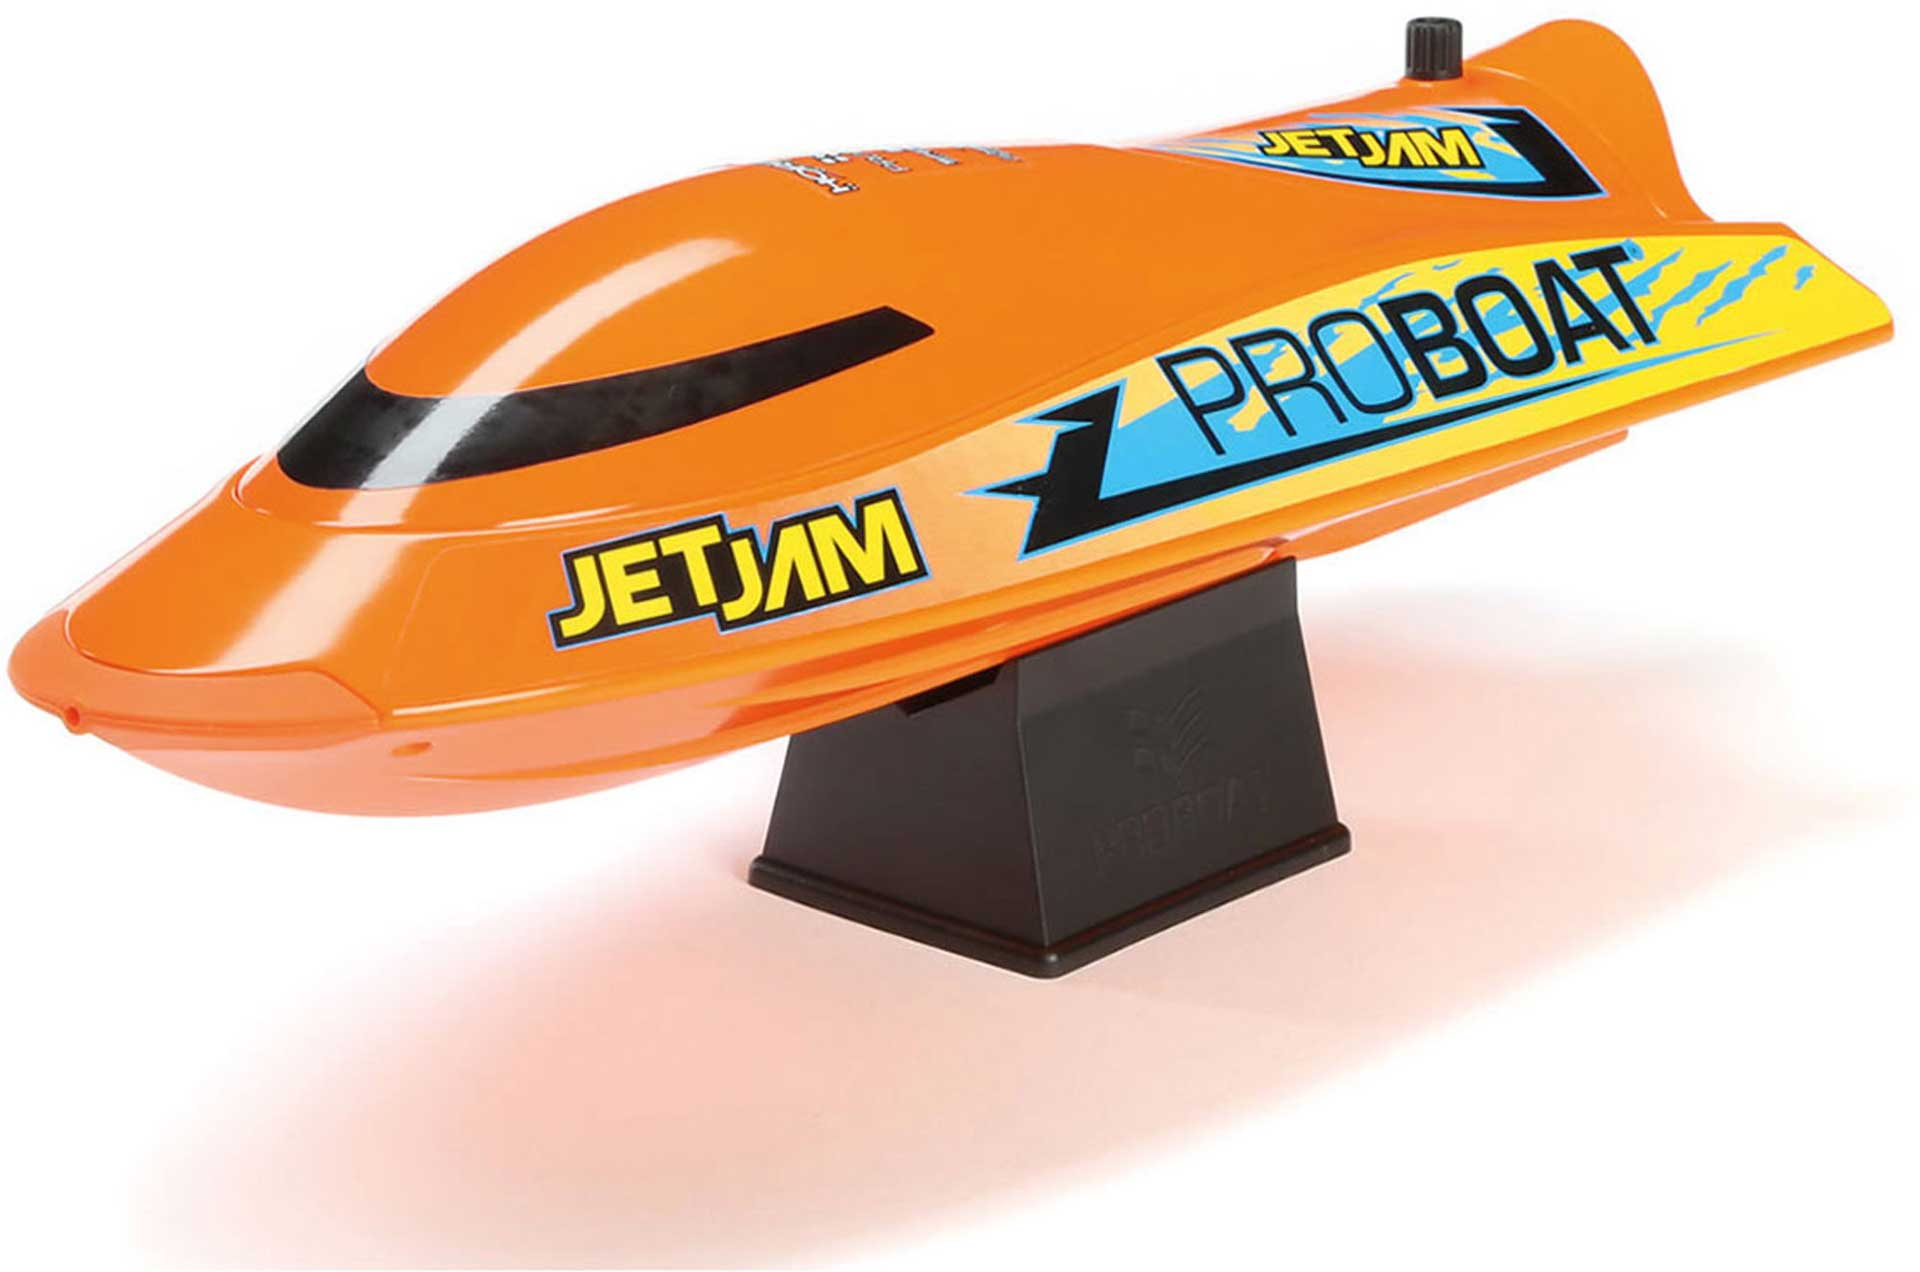 "PROBOAT JET JAM 12"" POOL RACER RTR ORANGE POOLFUN WITH JET DRIVE"